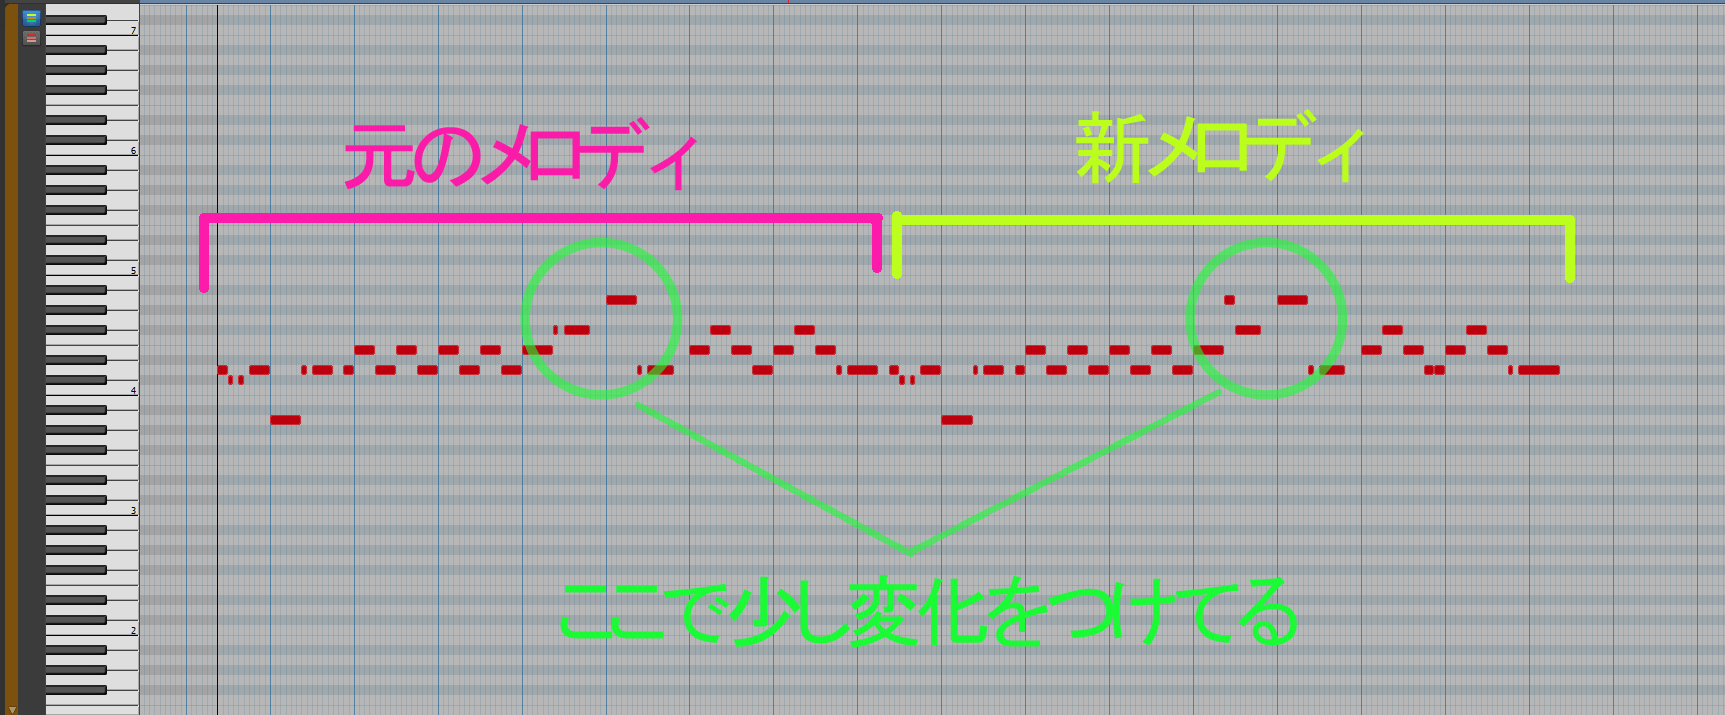 jk_melody_midi_2_tx